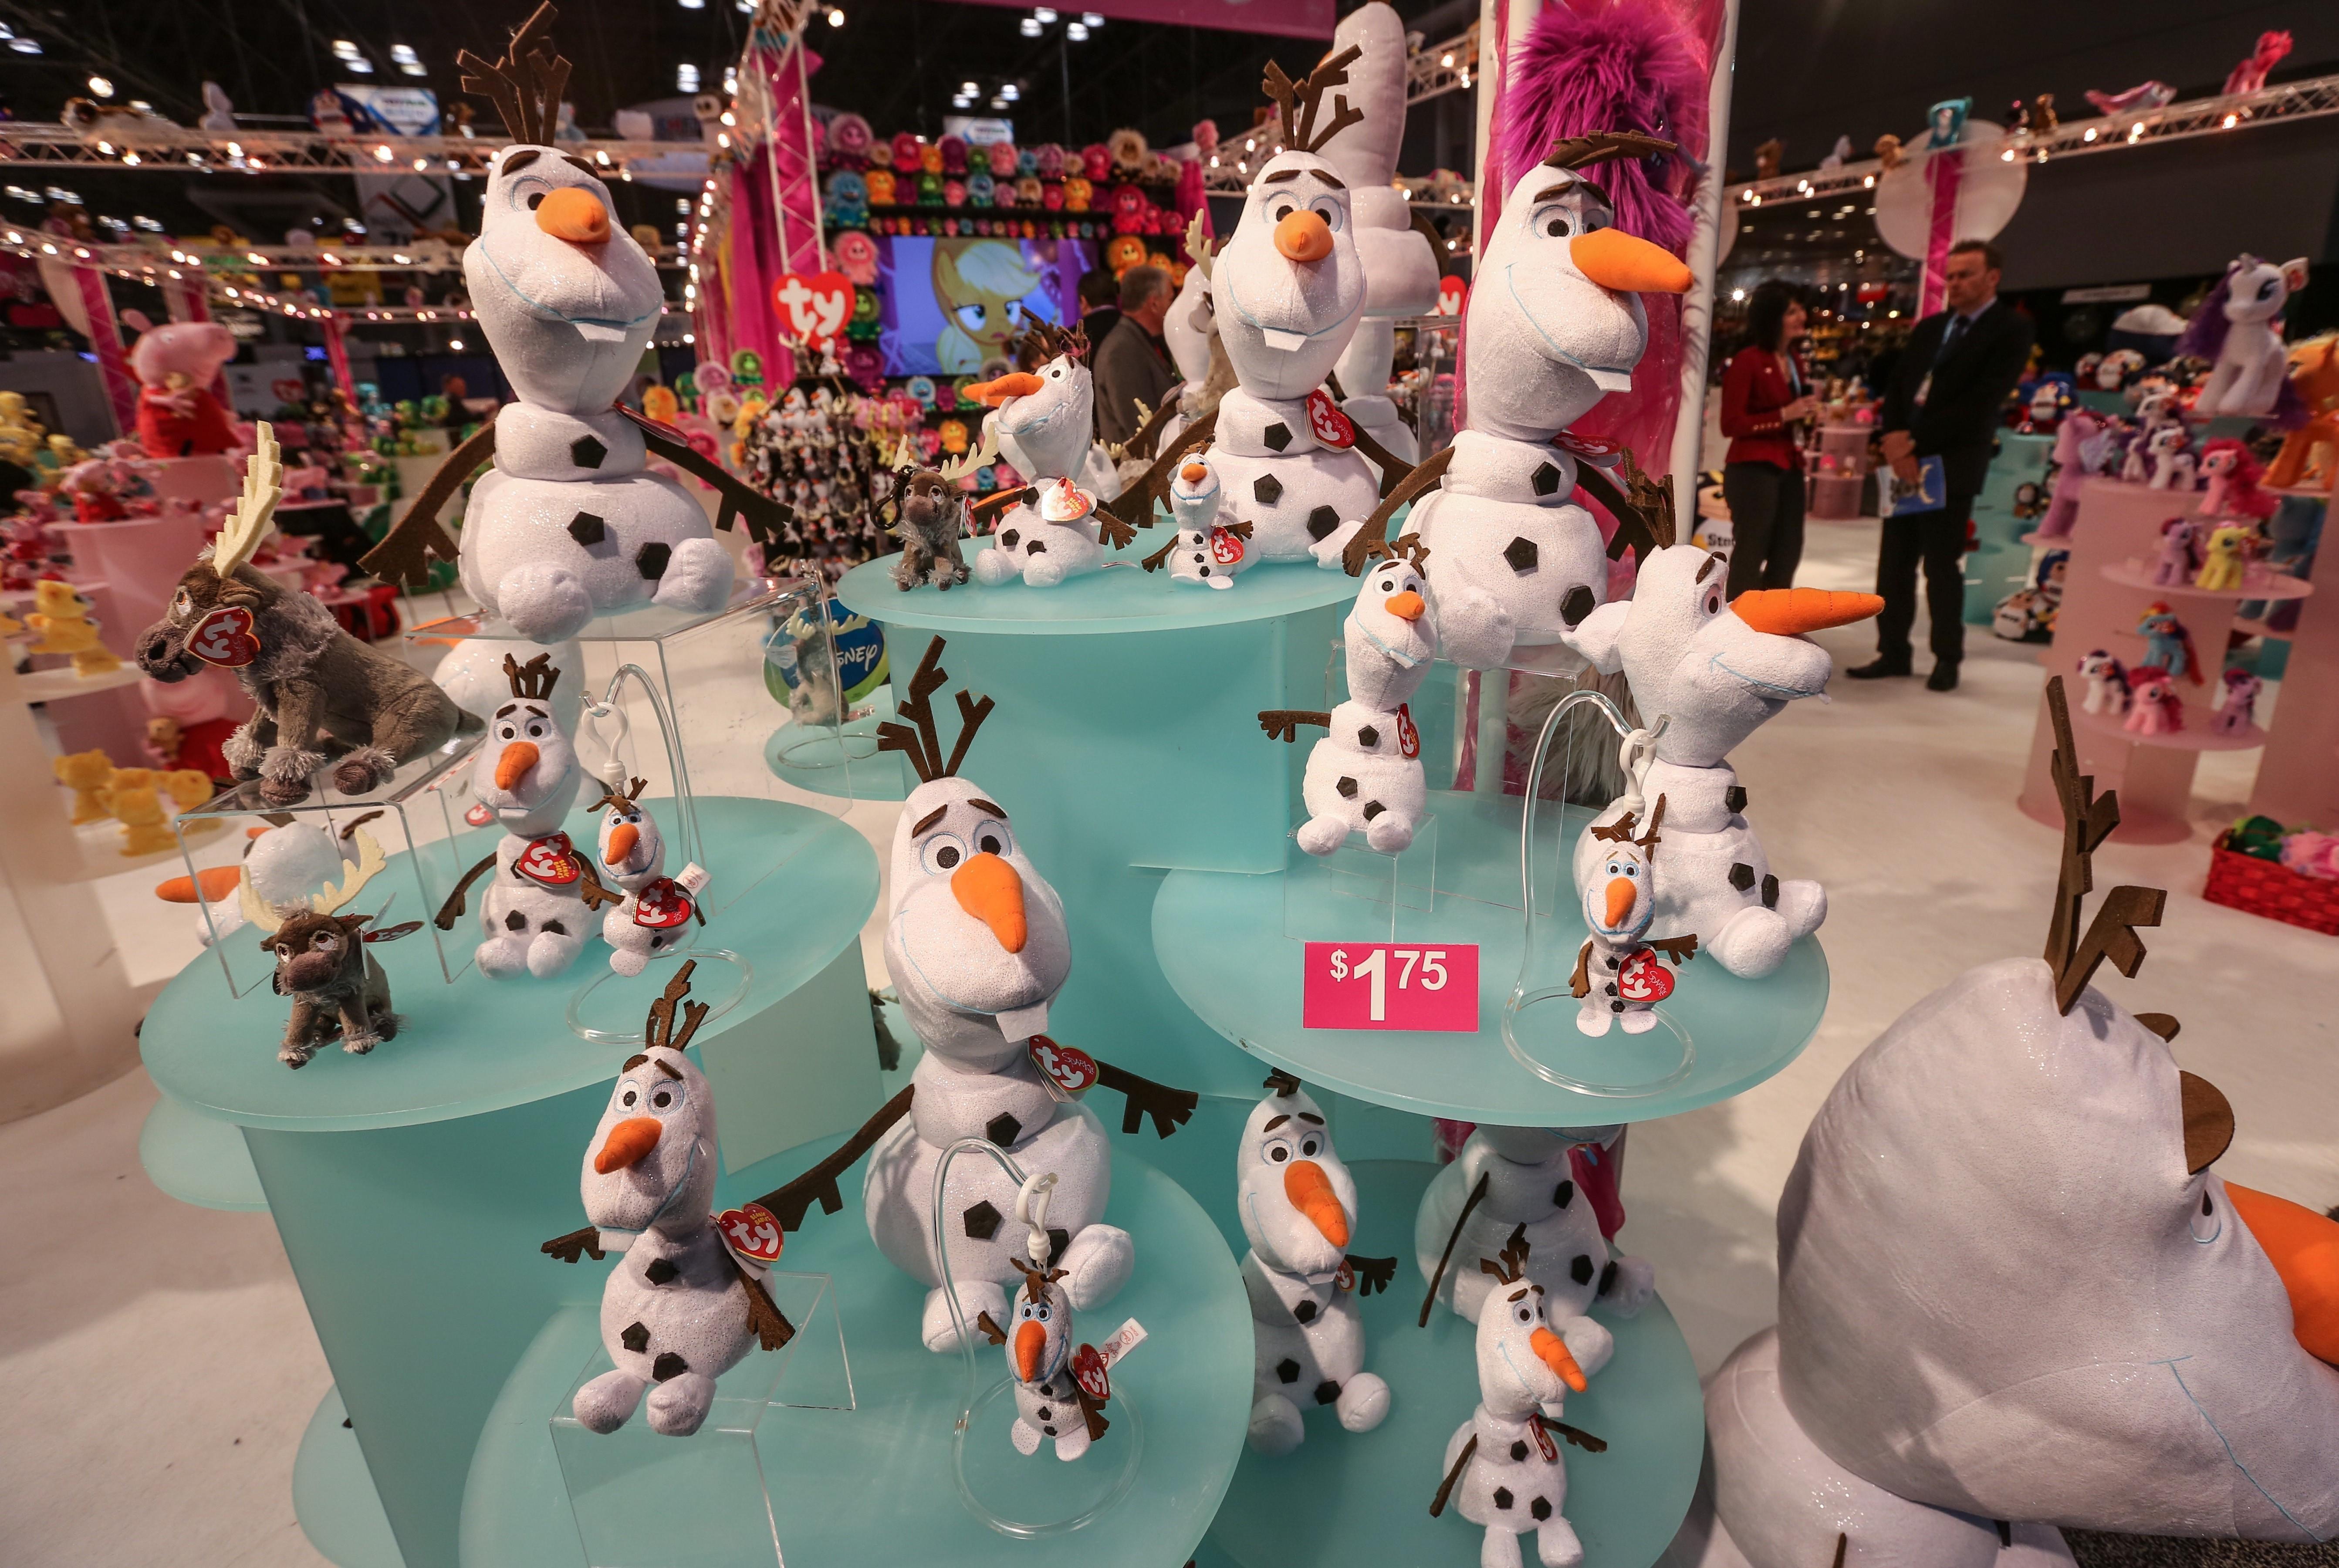 The 112th annual North American International Toy Fair